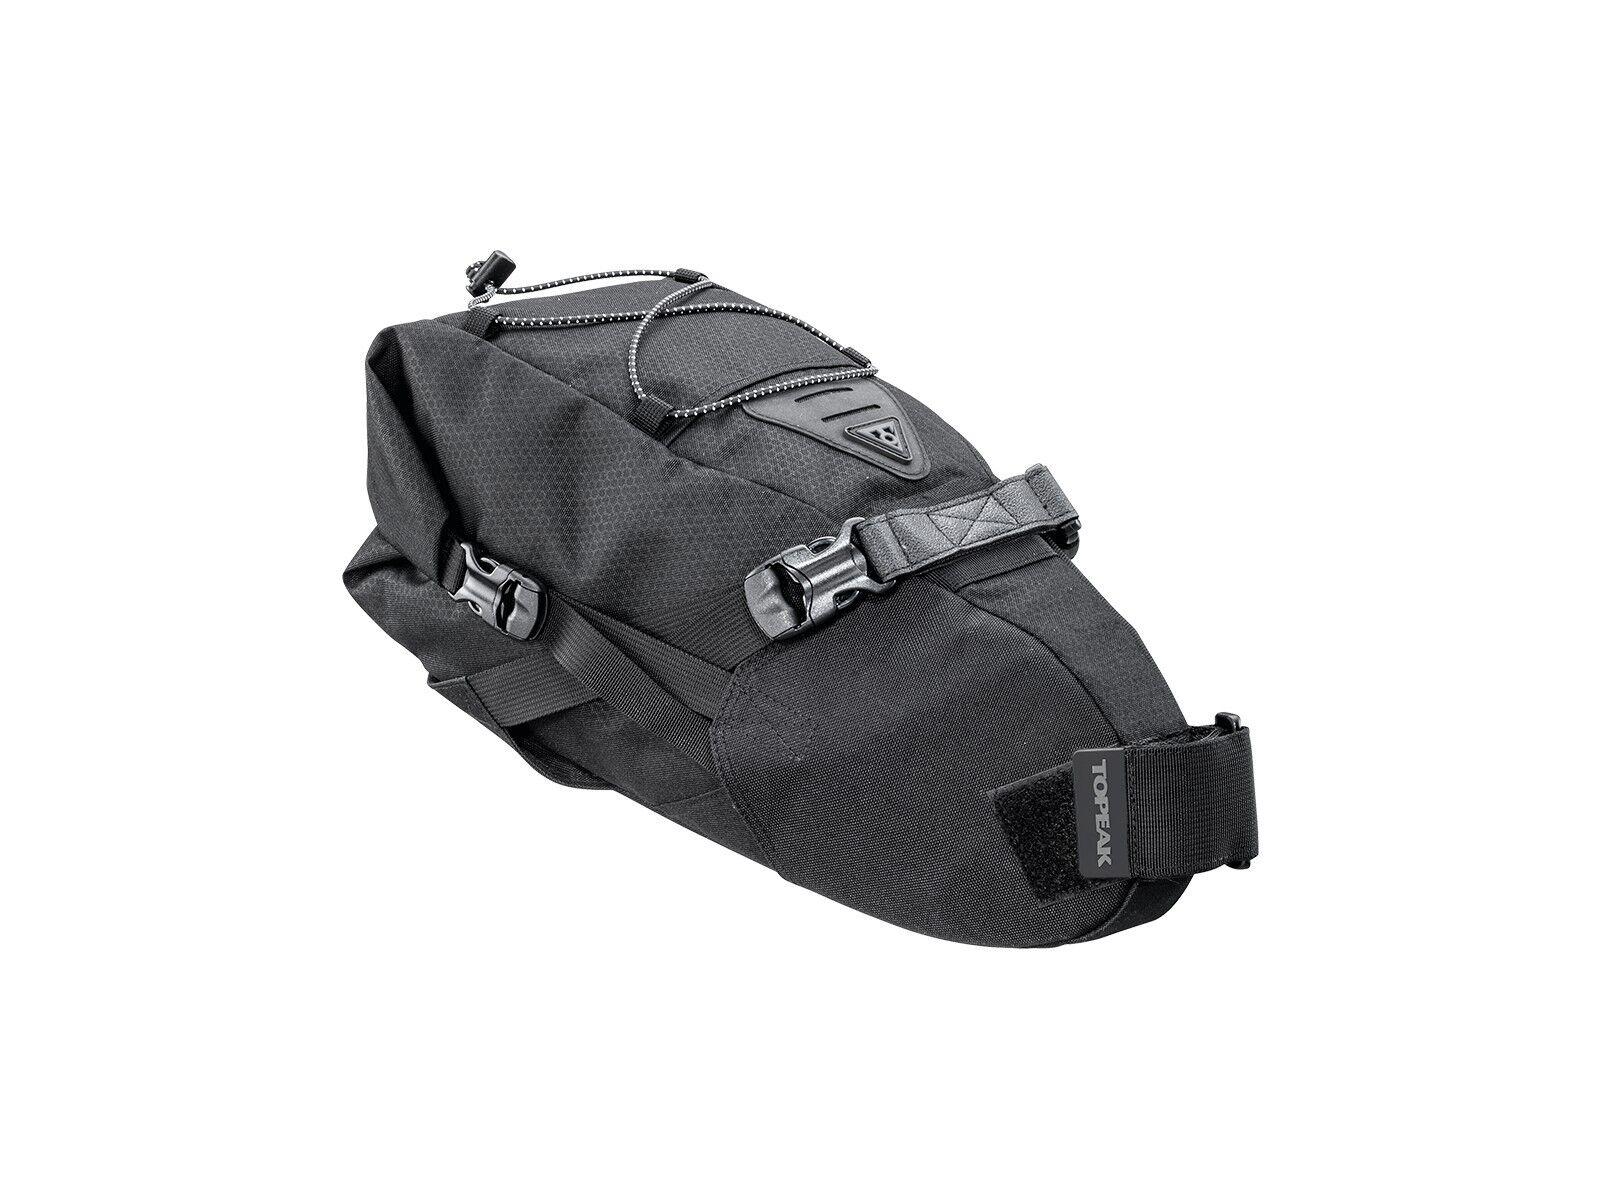 Topeak backloader 10l bicicleta para gravel bike-estanco saco interior hasta 5kg